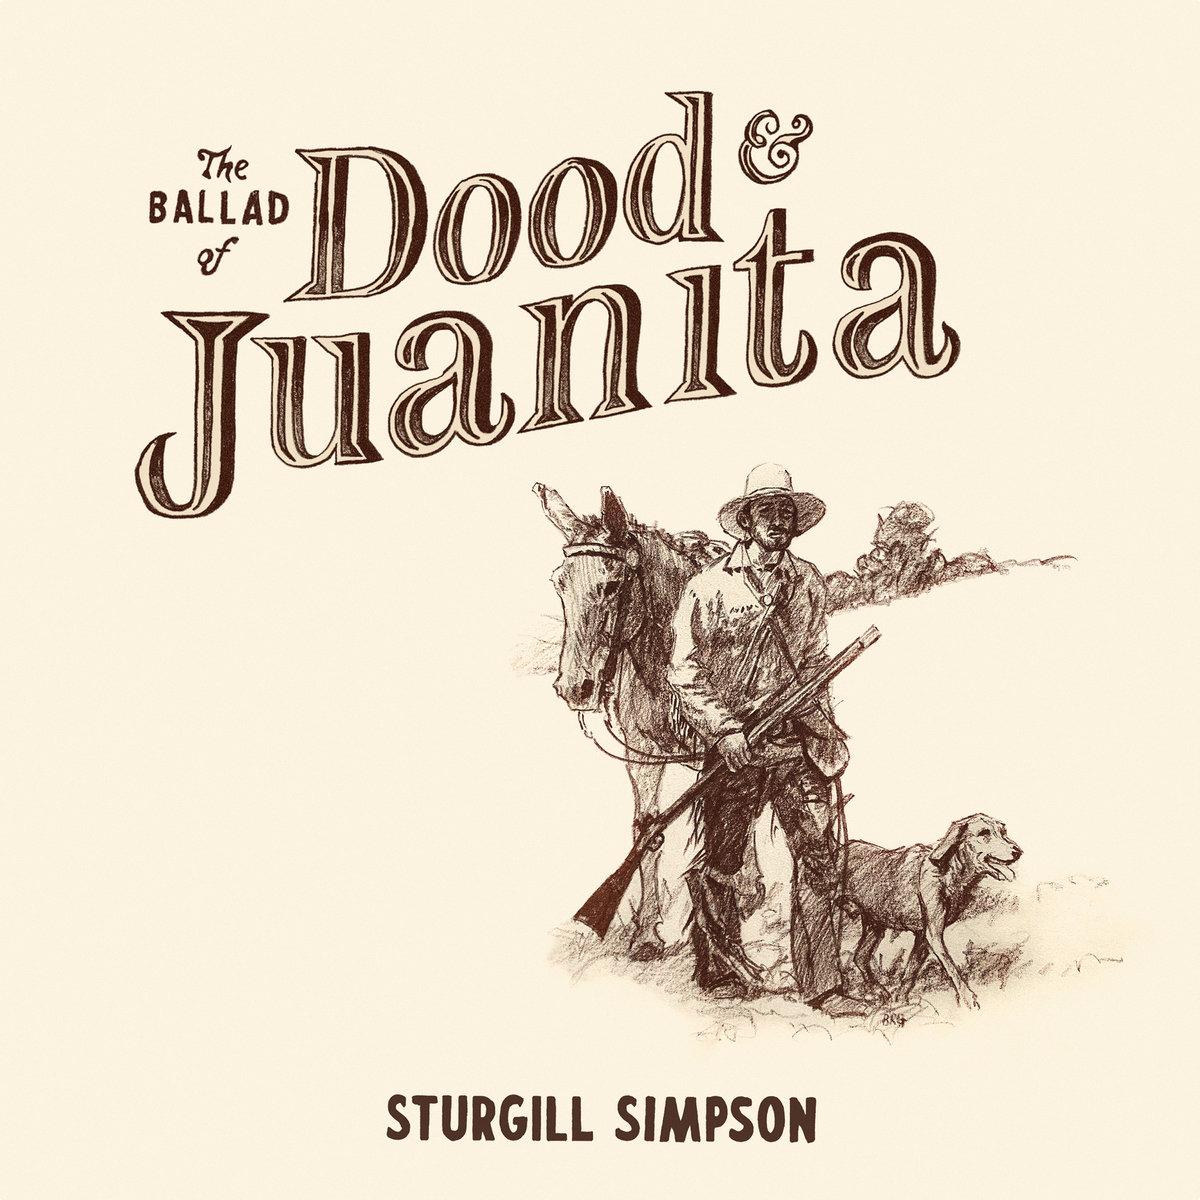 Sturgill Simpson - The Ballad Of Dood and Juanita